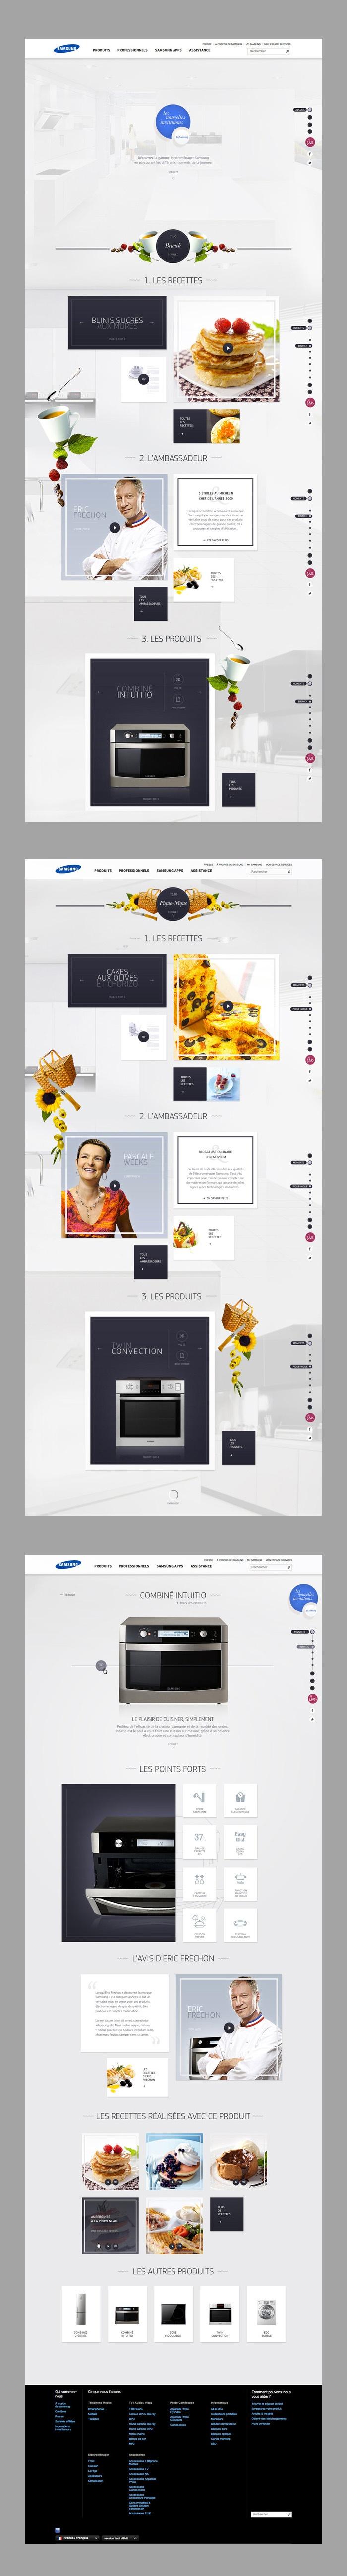 Nouvelles Invitations by Samsung / Conception, Creative Direction & Art Direction / April 2012